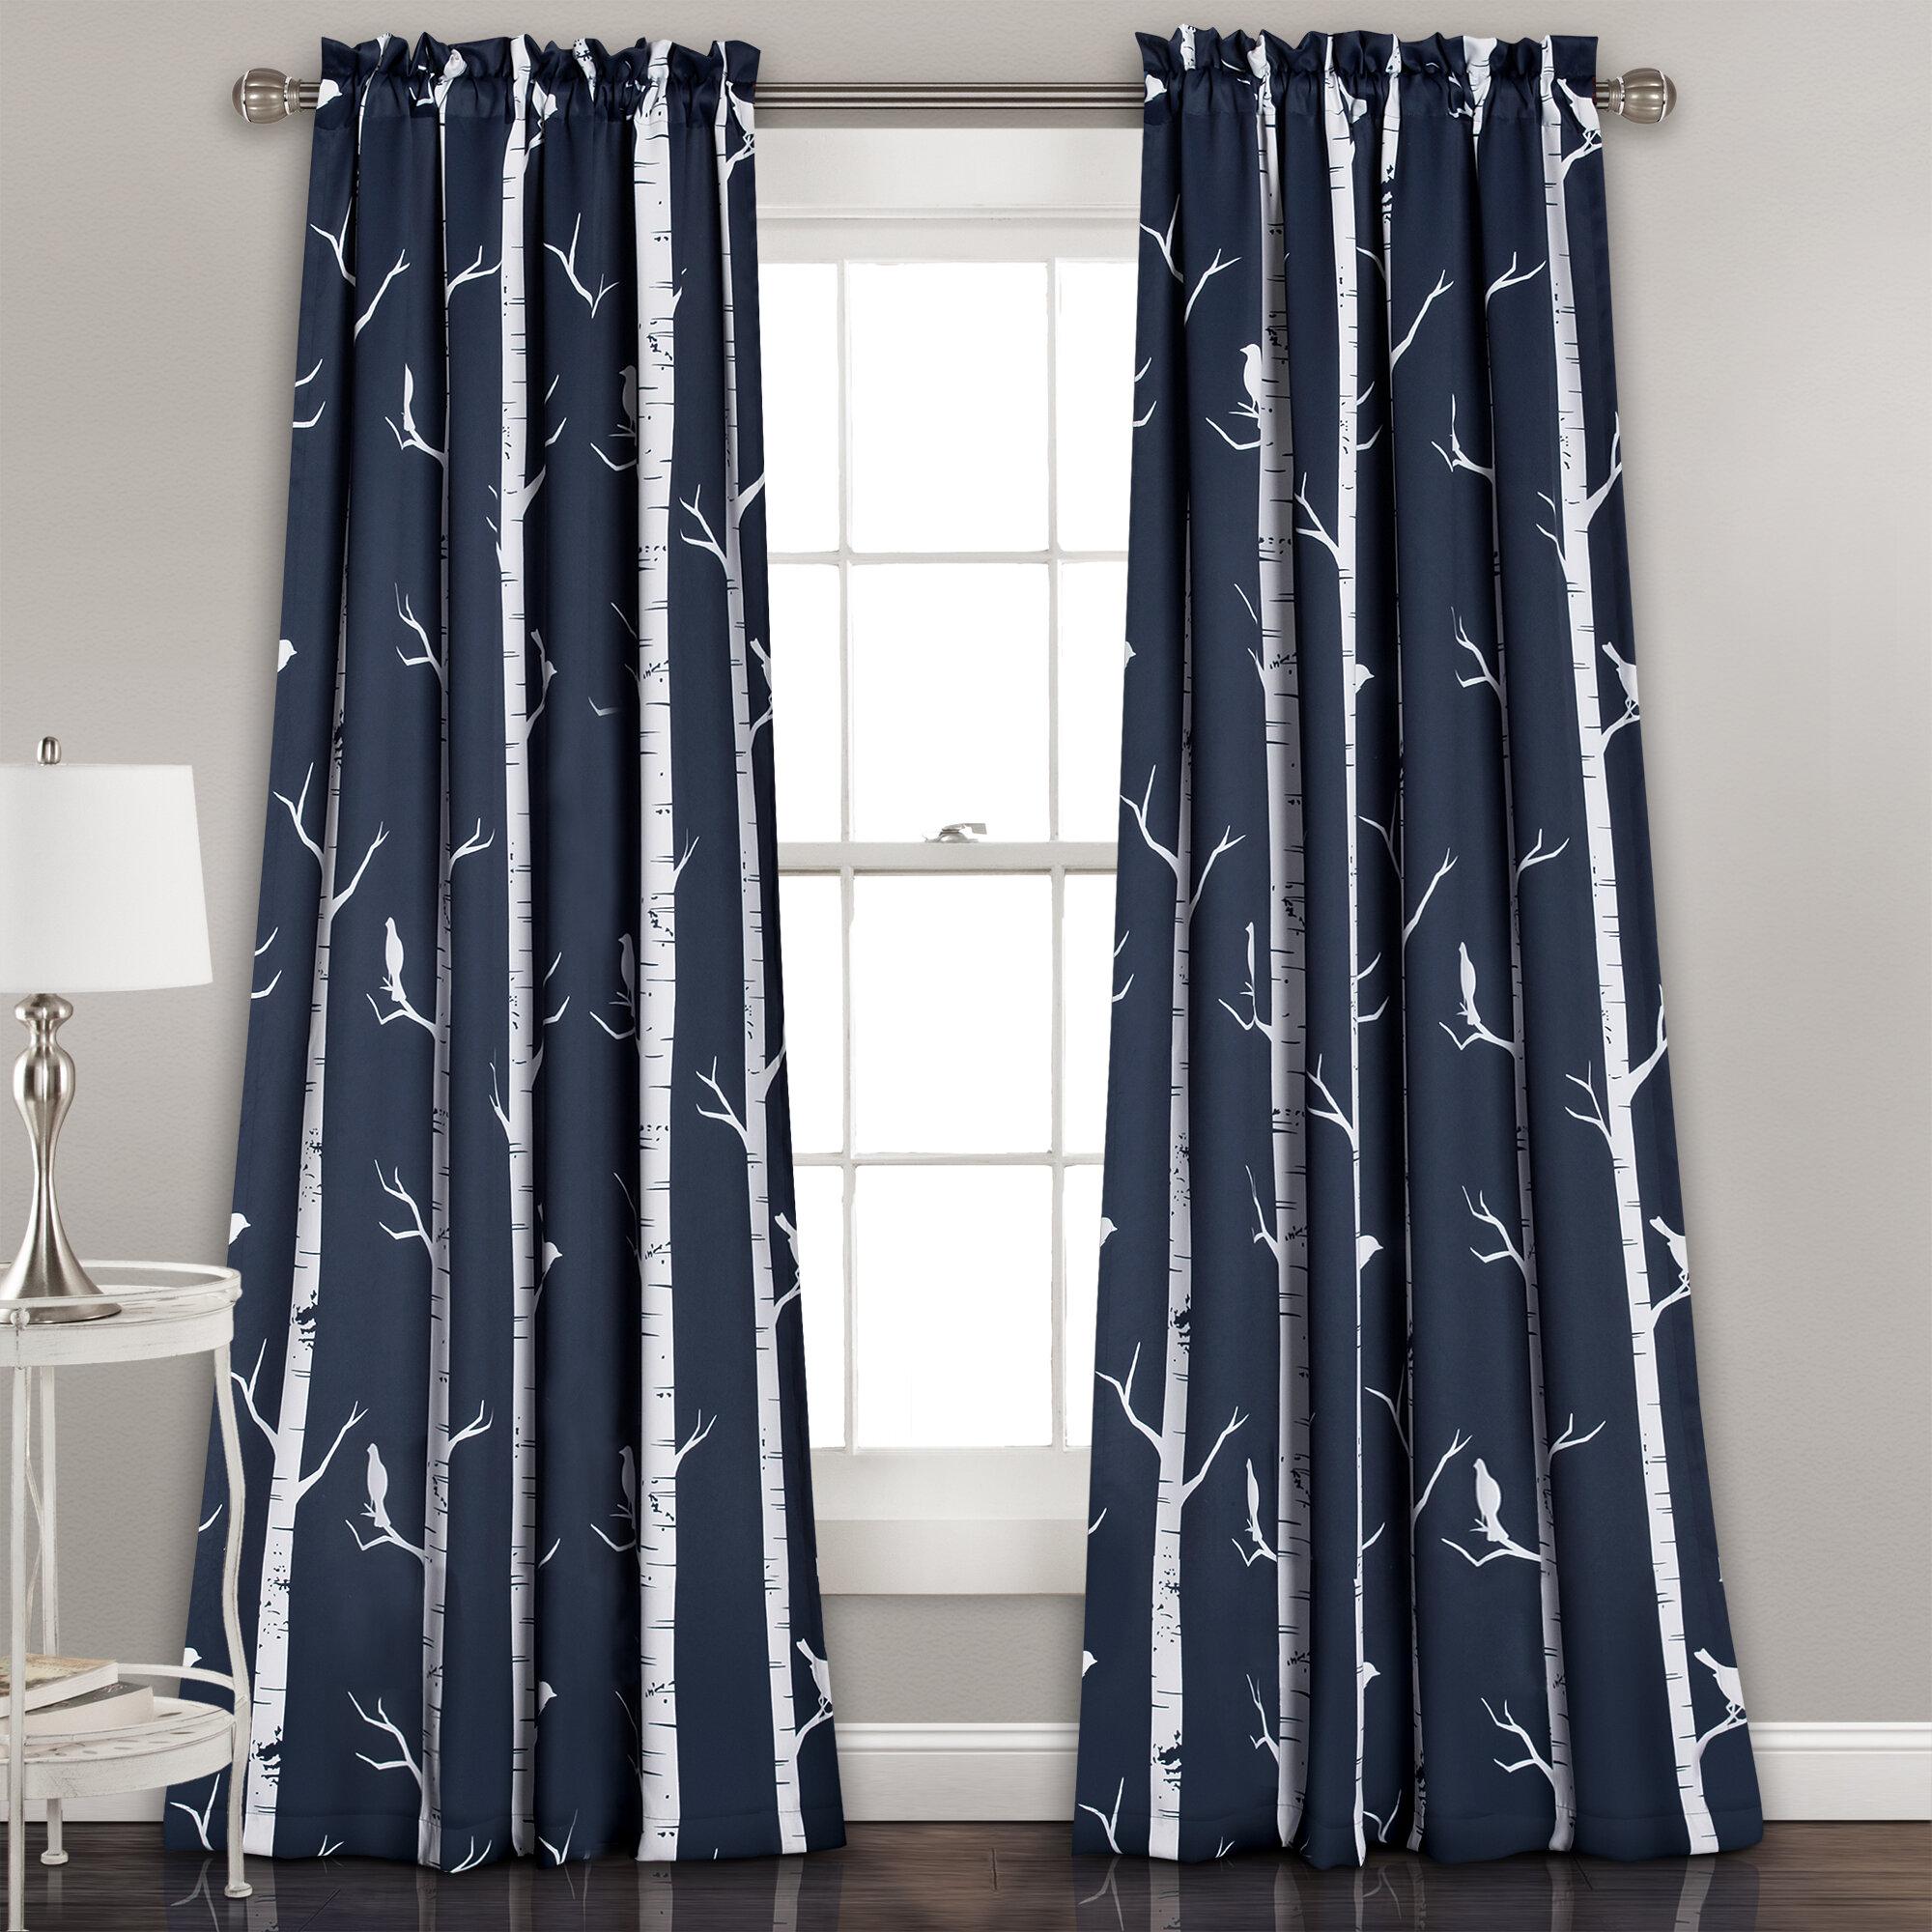 Wrought Studio Mendon Floral Room Darkening Thermal Rod Pocket Curtain Panels Reviews Wayfair